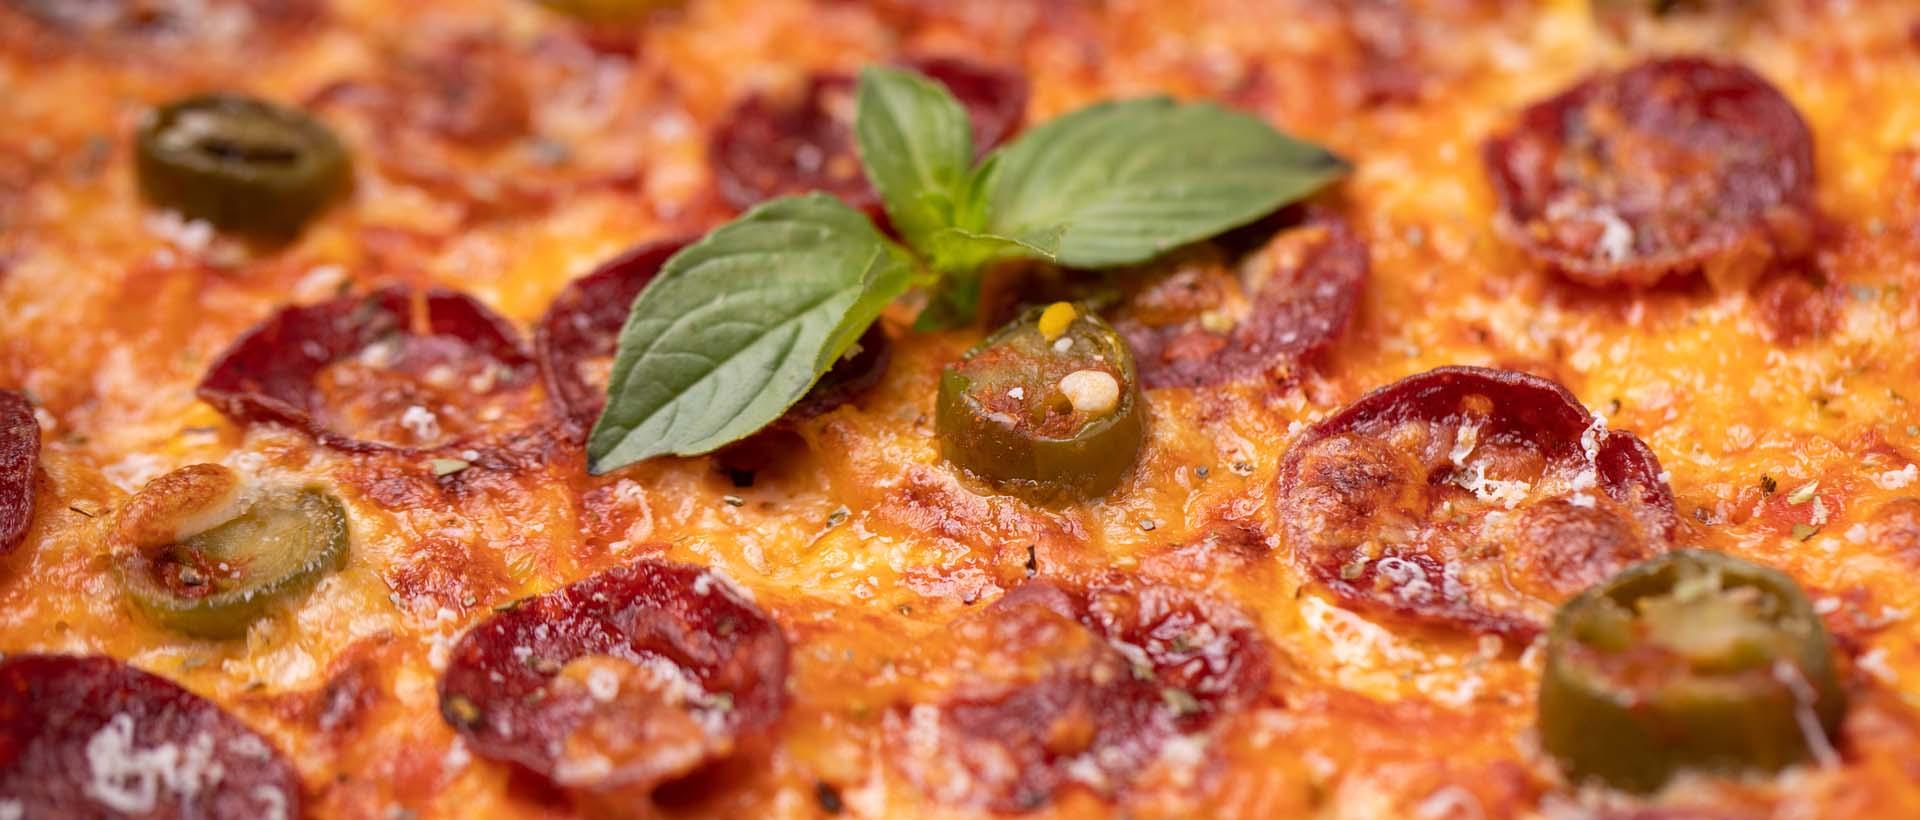 طعم اصیل پیتزا ایتالیایی